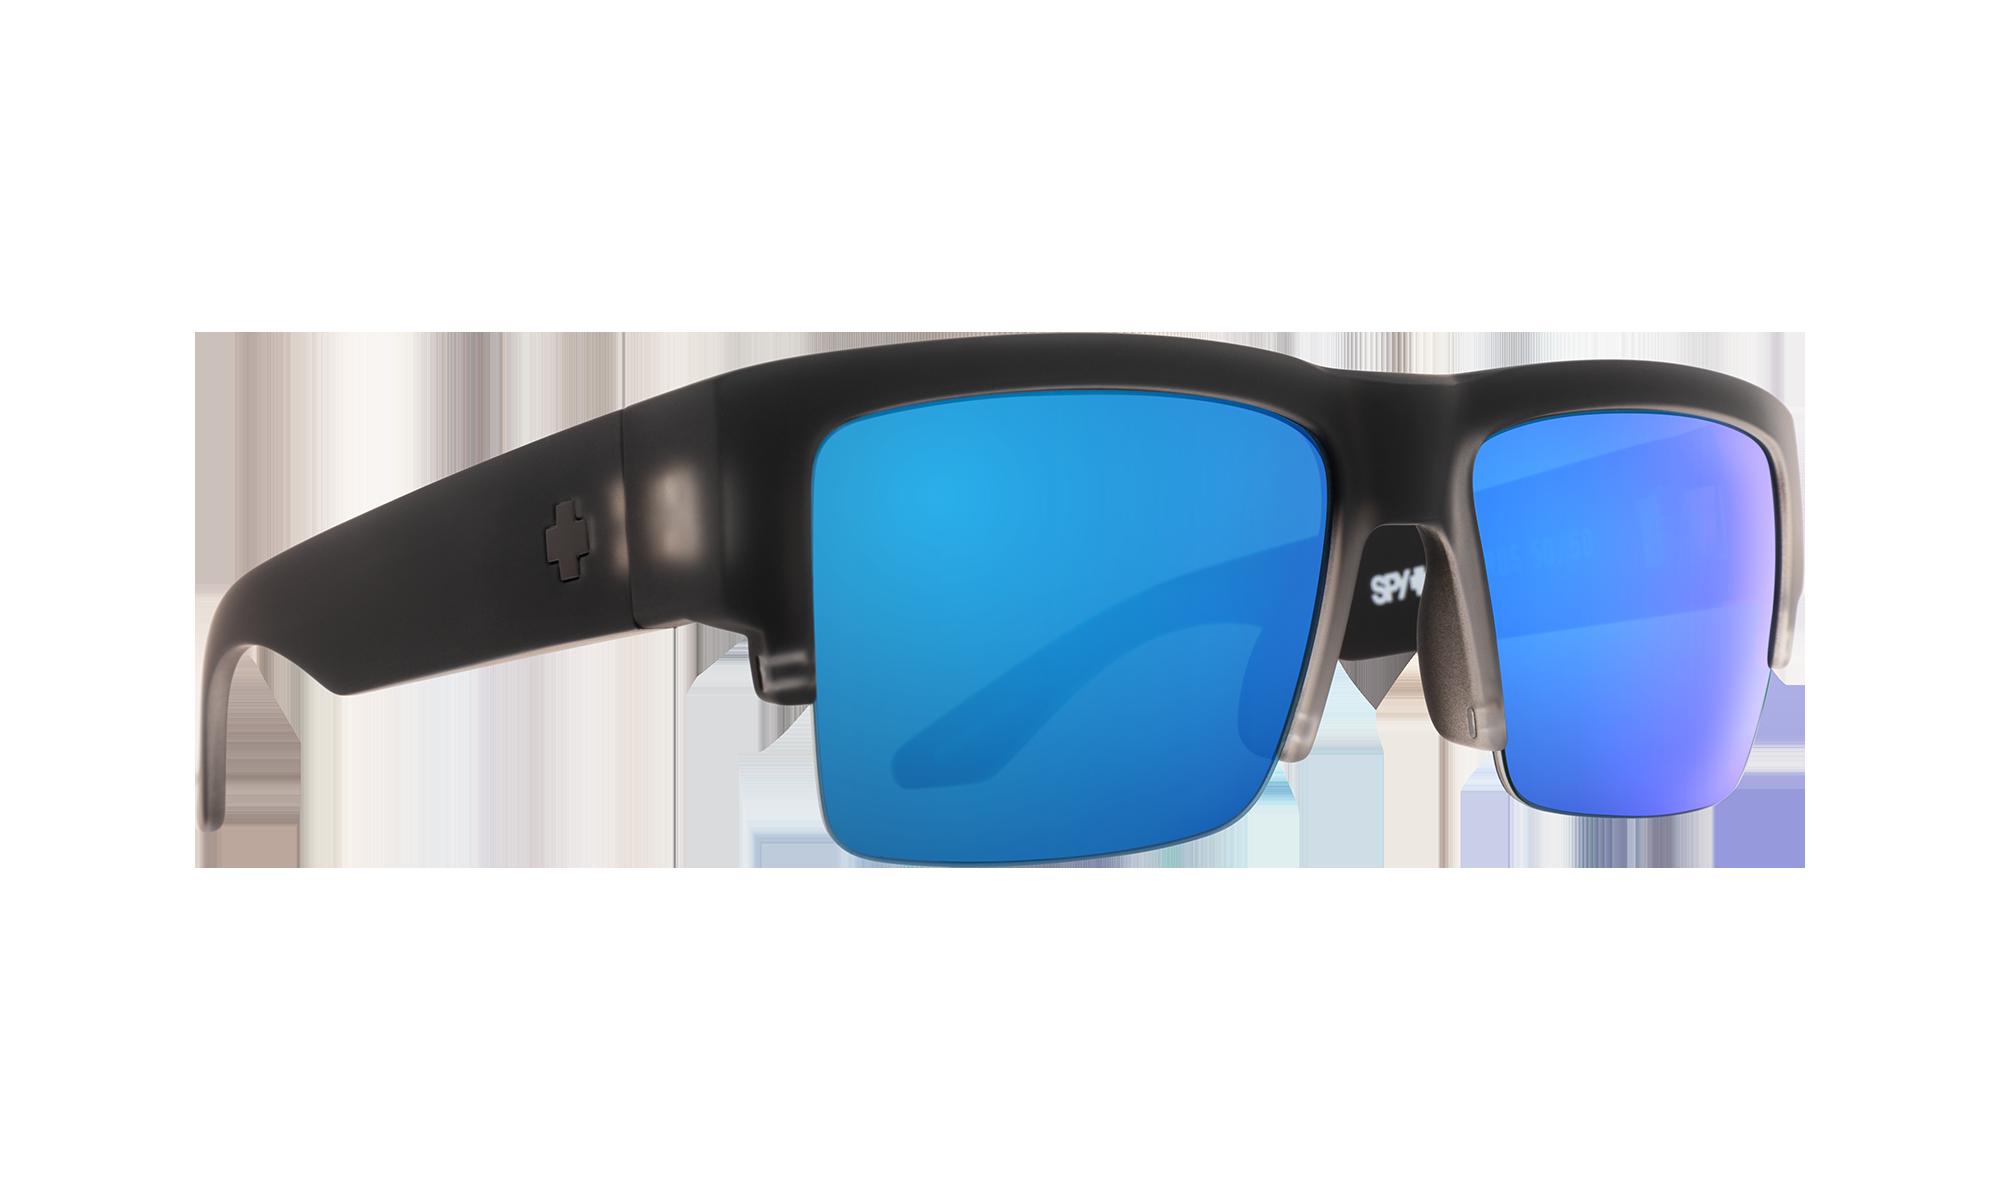 SPY Spy Cyrus 5050 Sunglasses